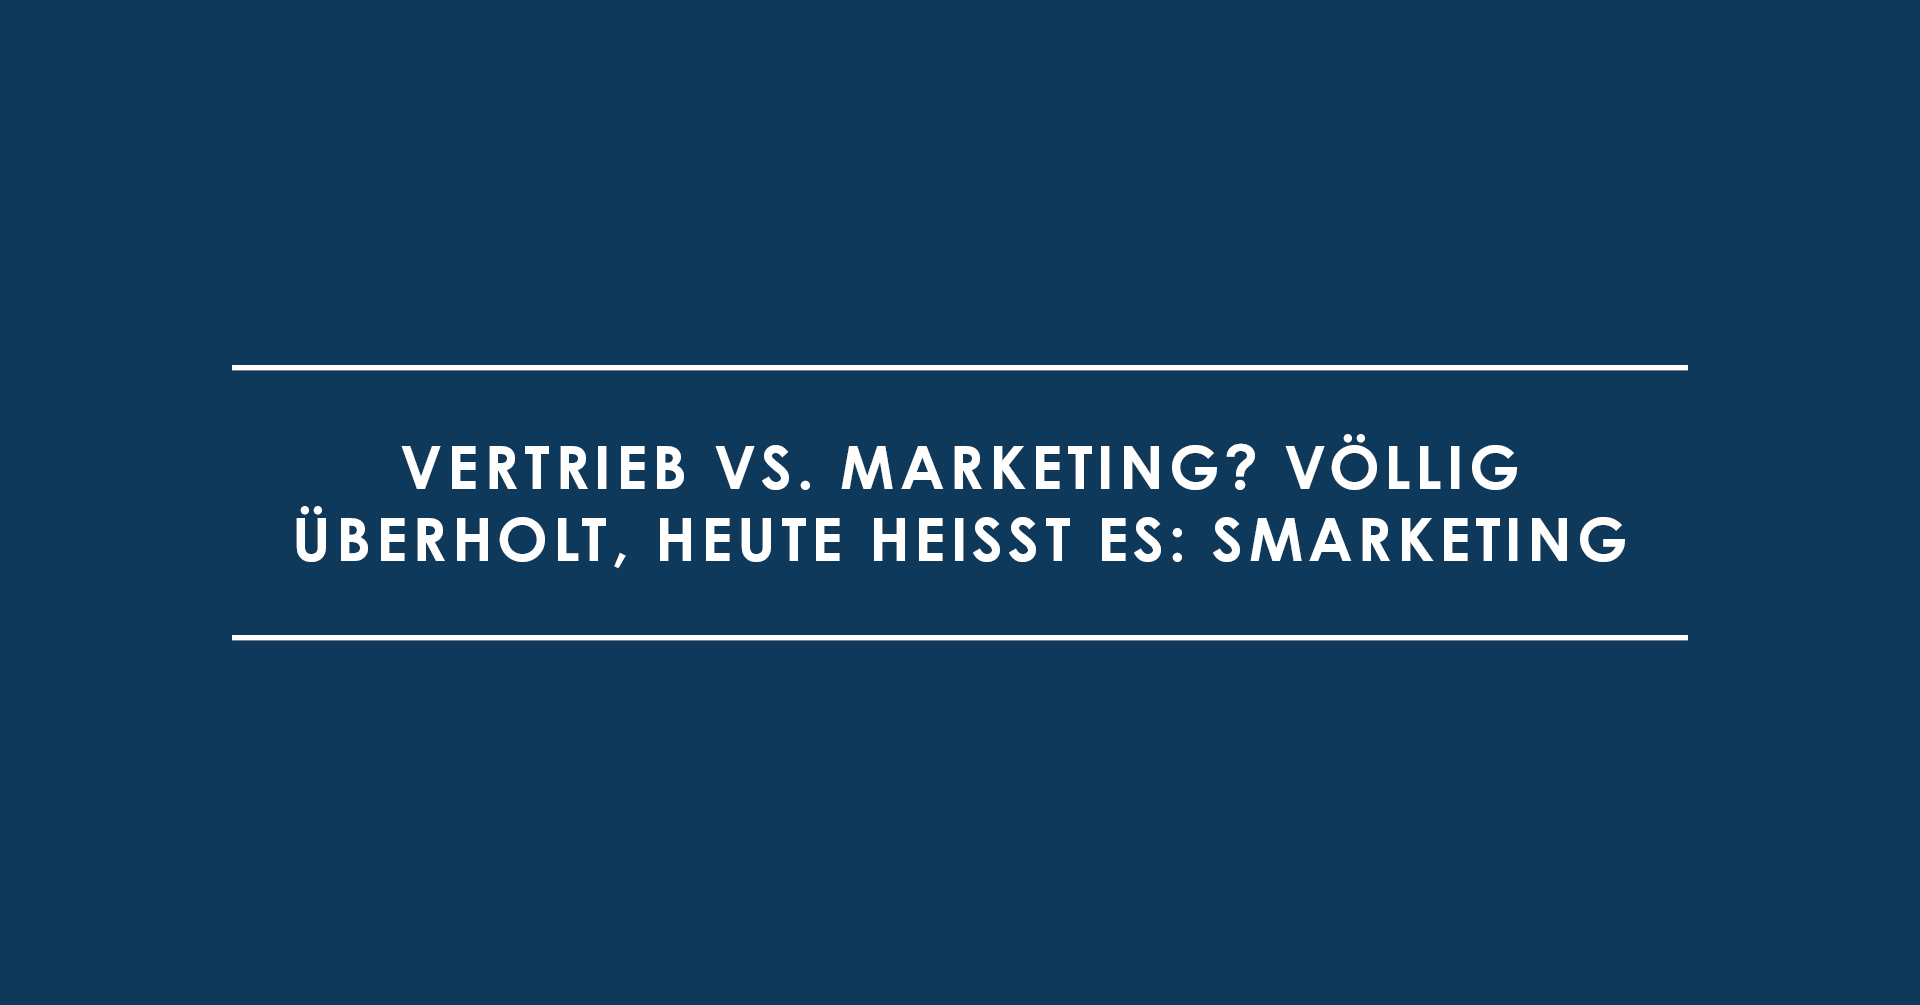 Vertrieb vs. Marketing? Völlig überholt, heute heißt es: Smarketing